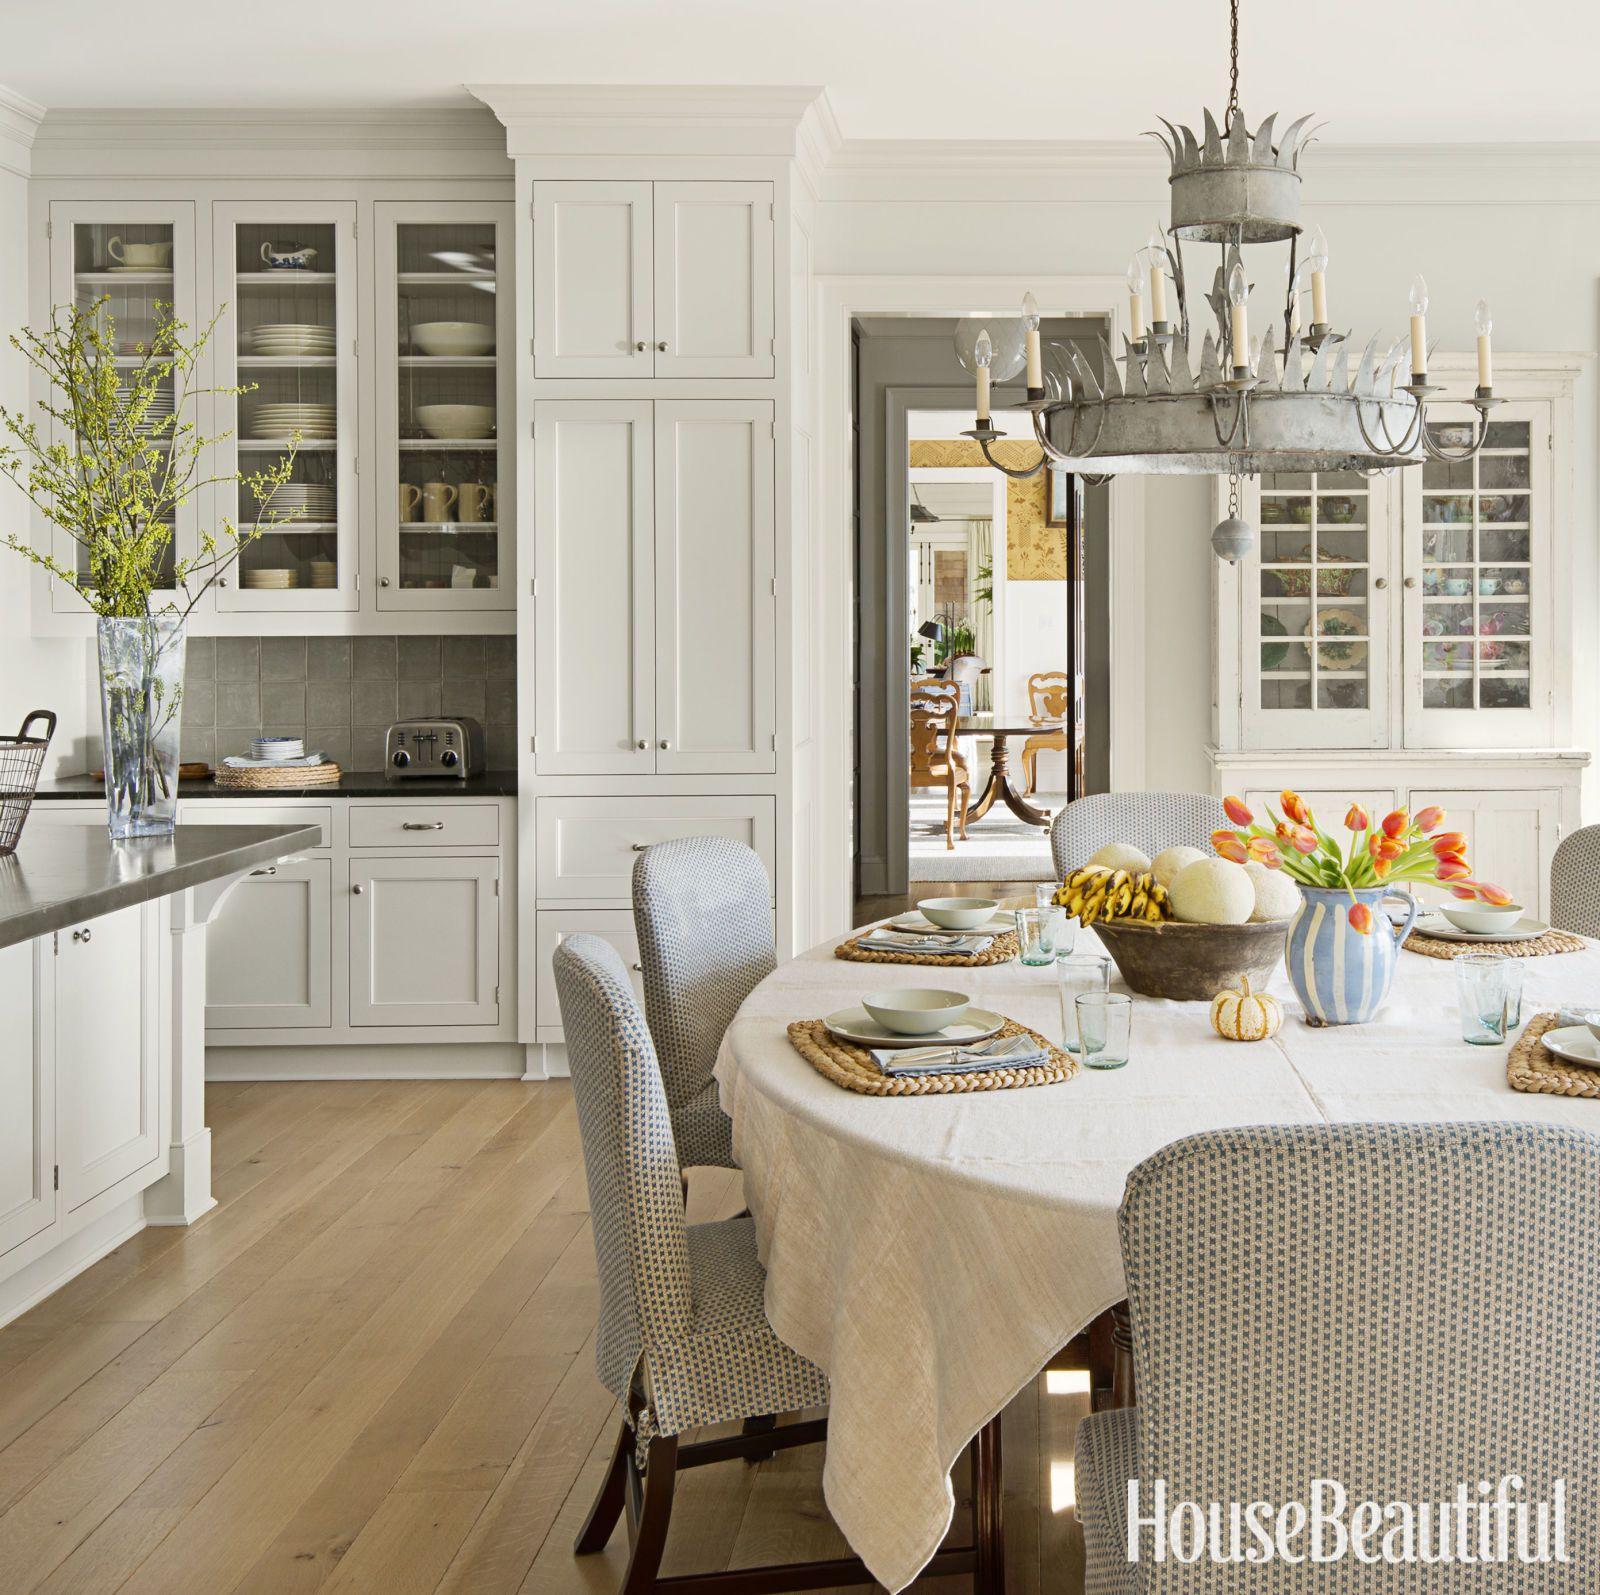 25 white kitchens that look like design heaven kitchen design kitchen interior home kitchens on kitchen ideas white id=58287